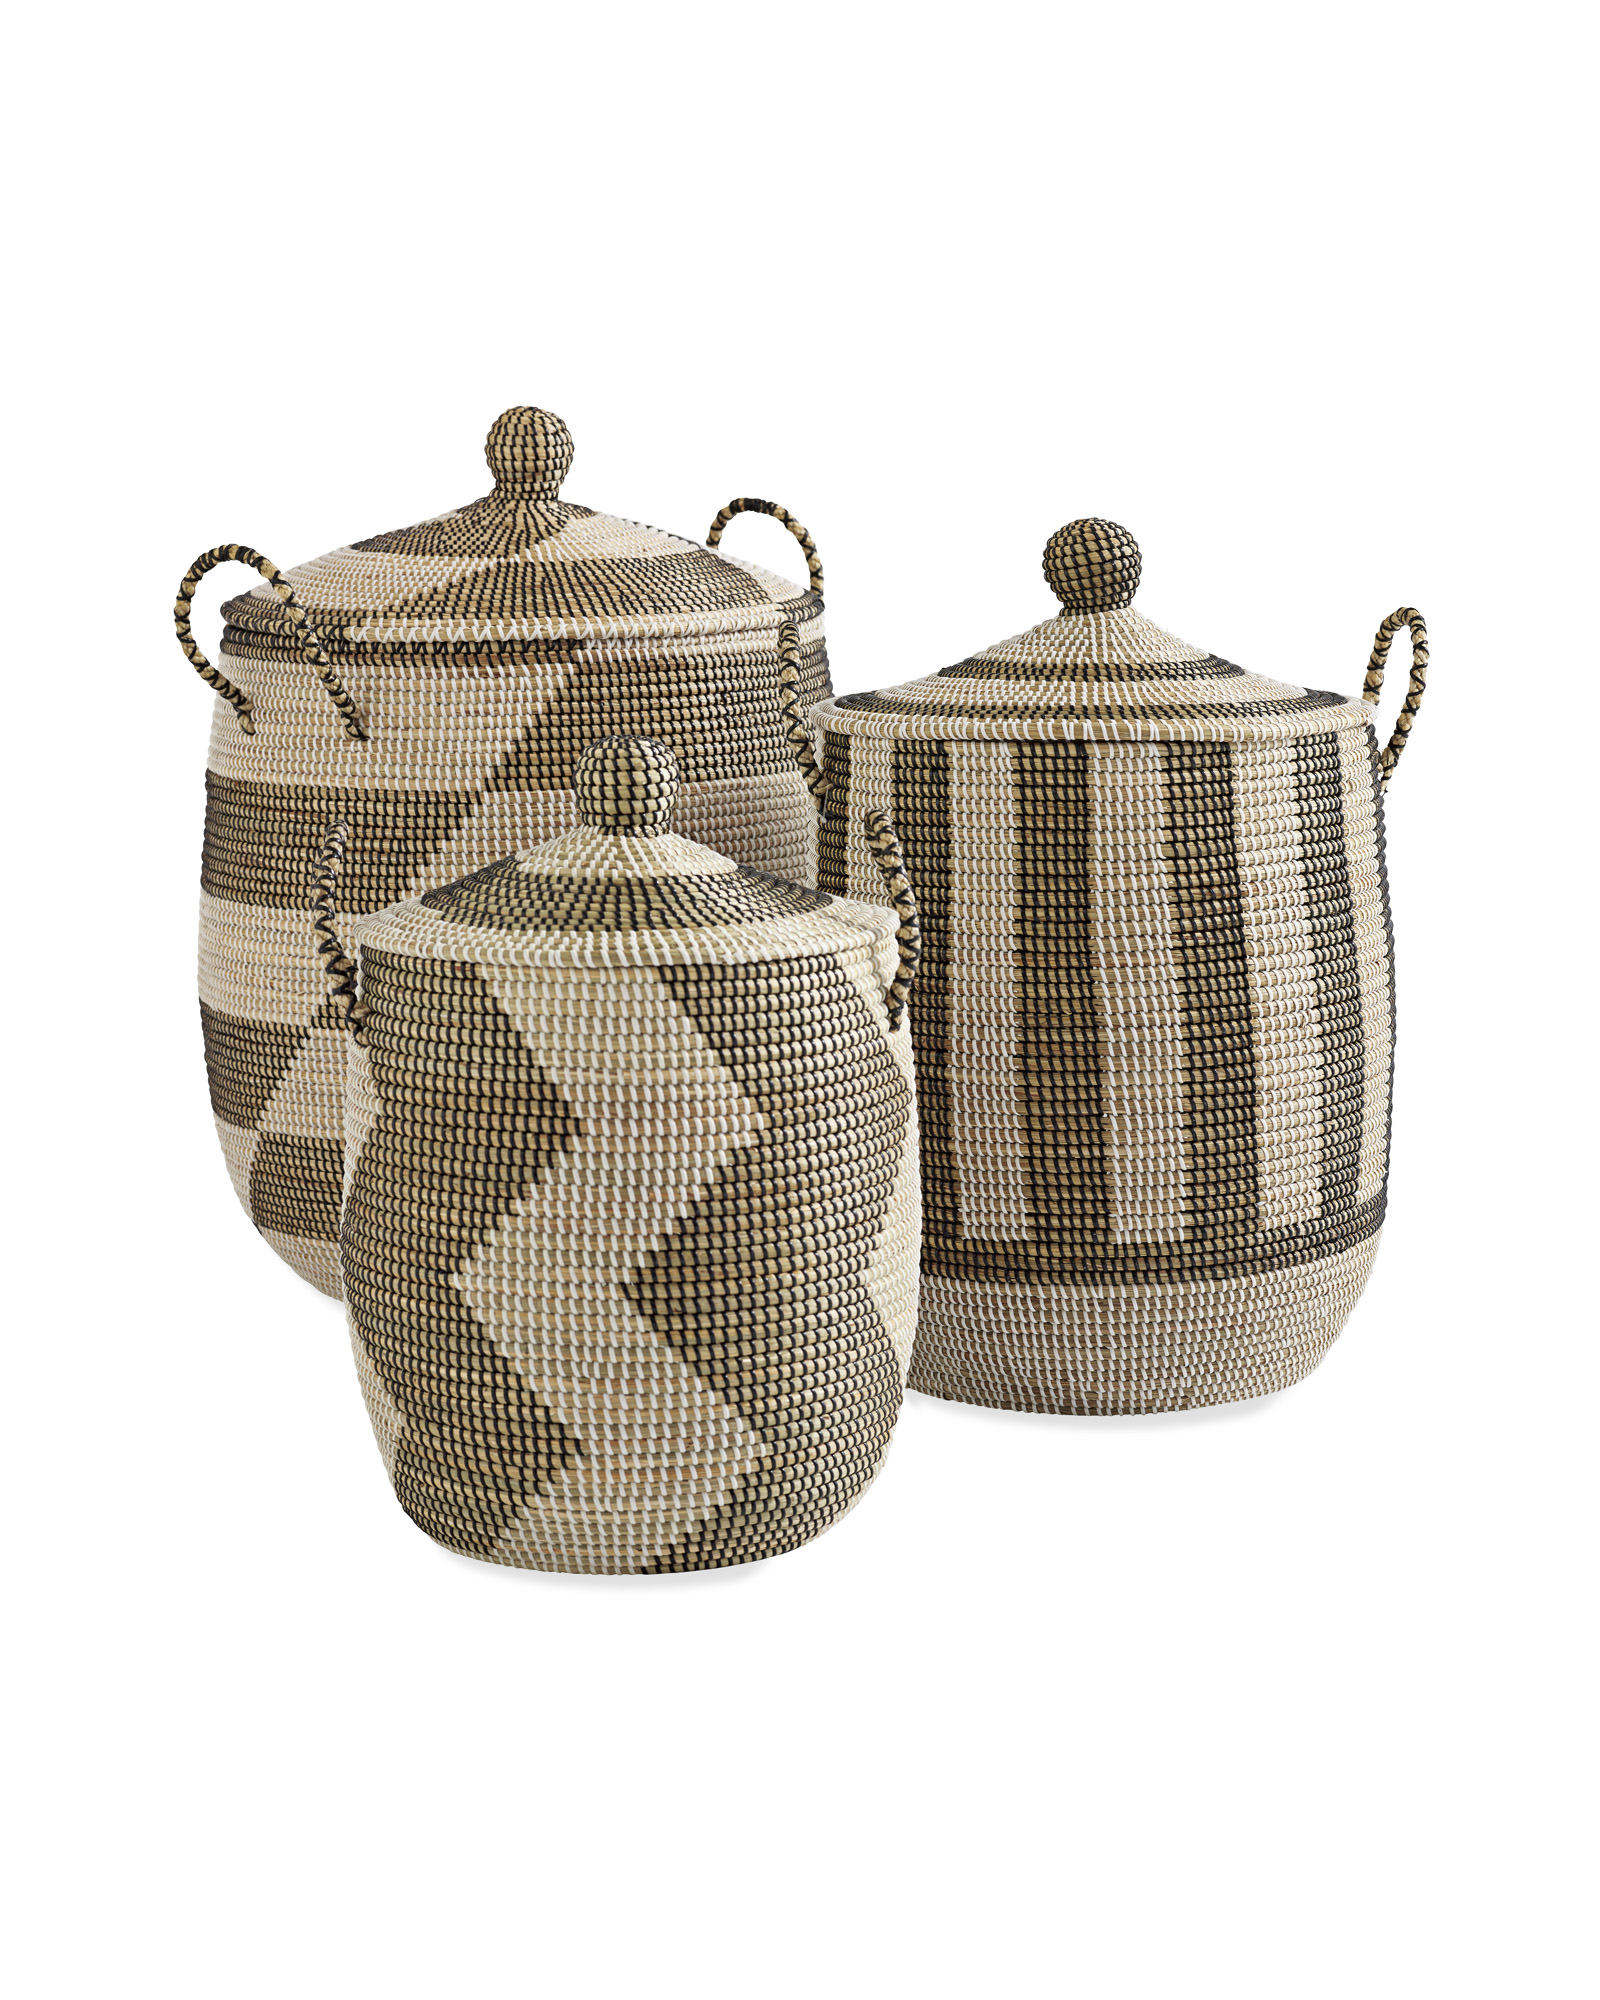 Striped La Jolla Basket - $168.00